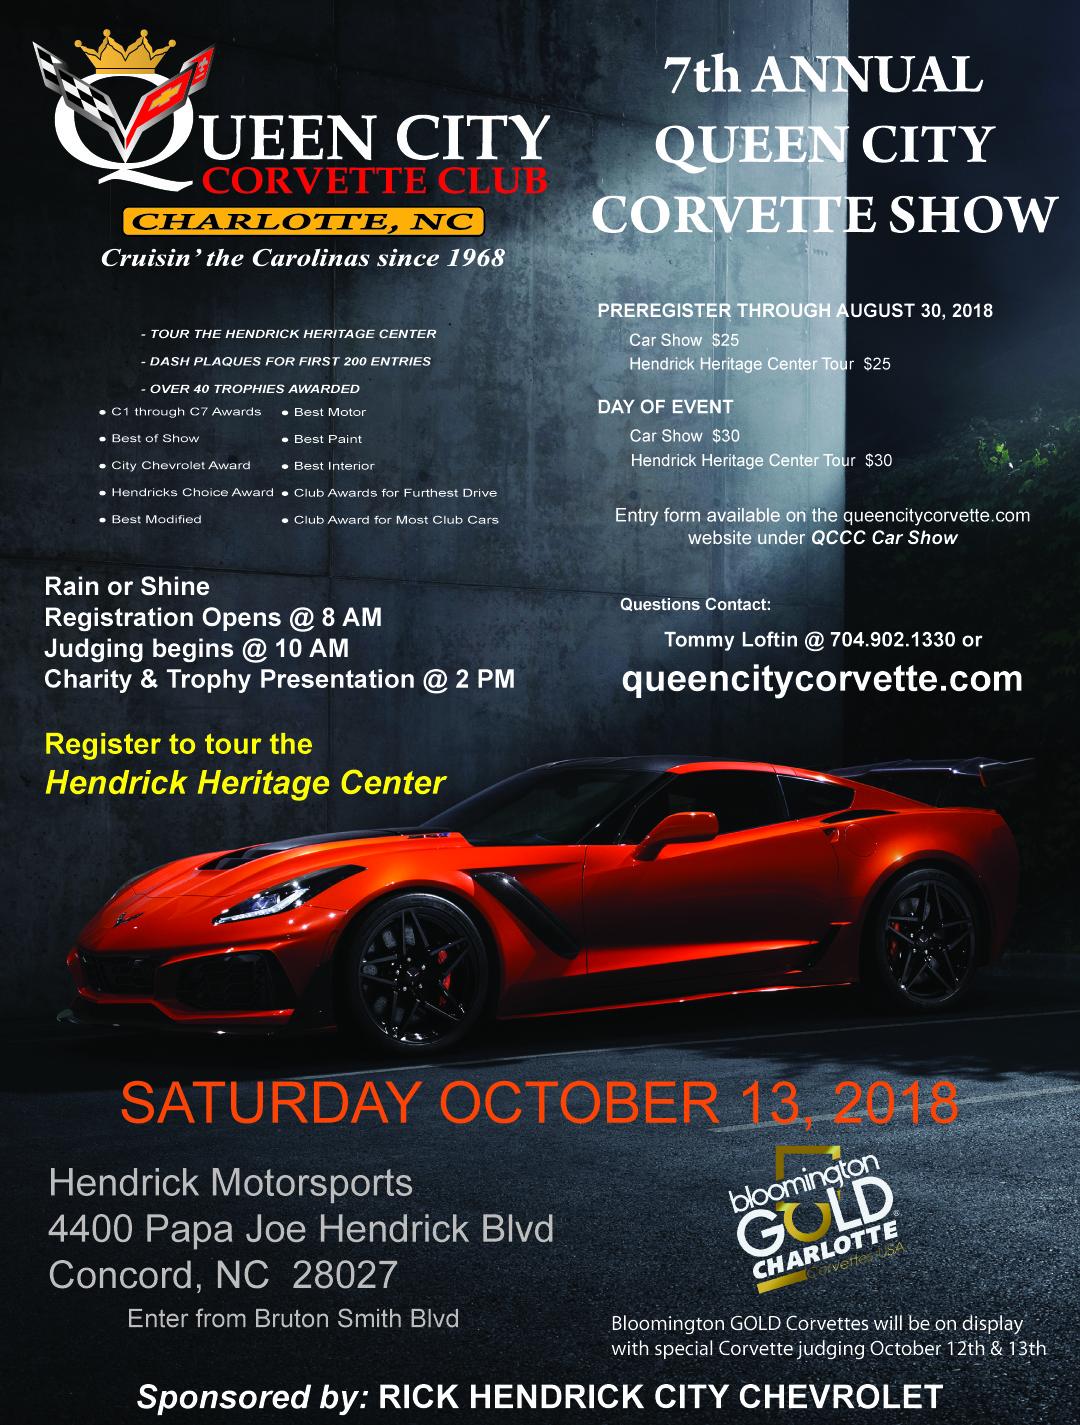 QCCC Car Show - Car show dash plaque display